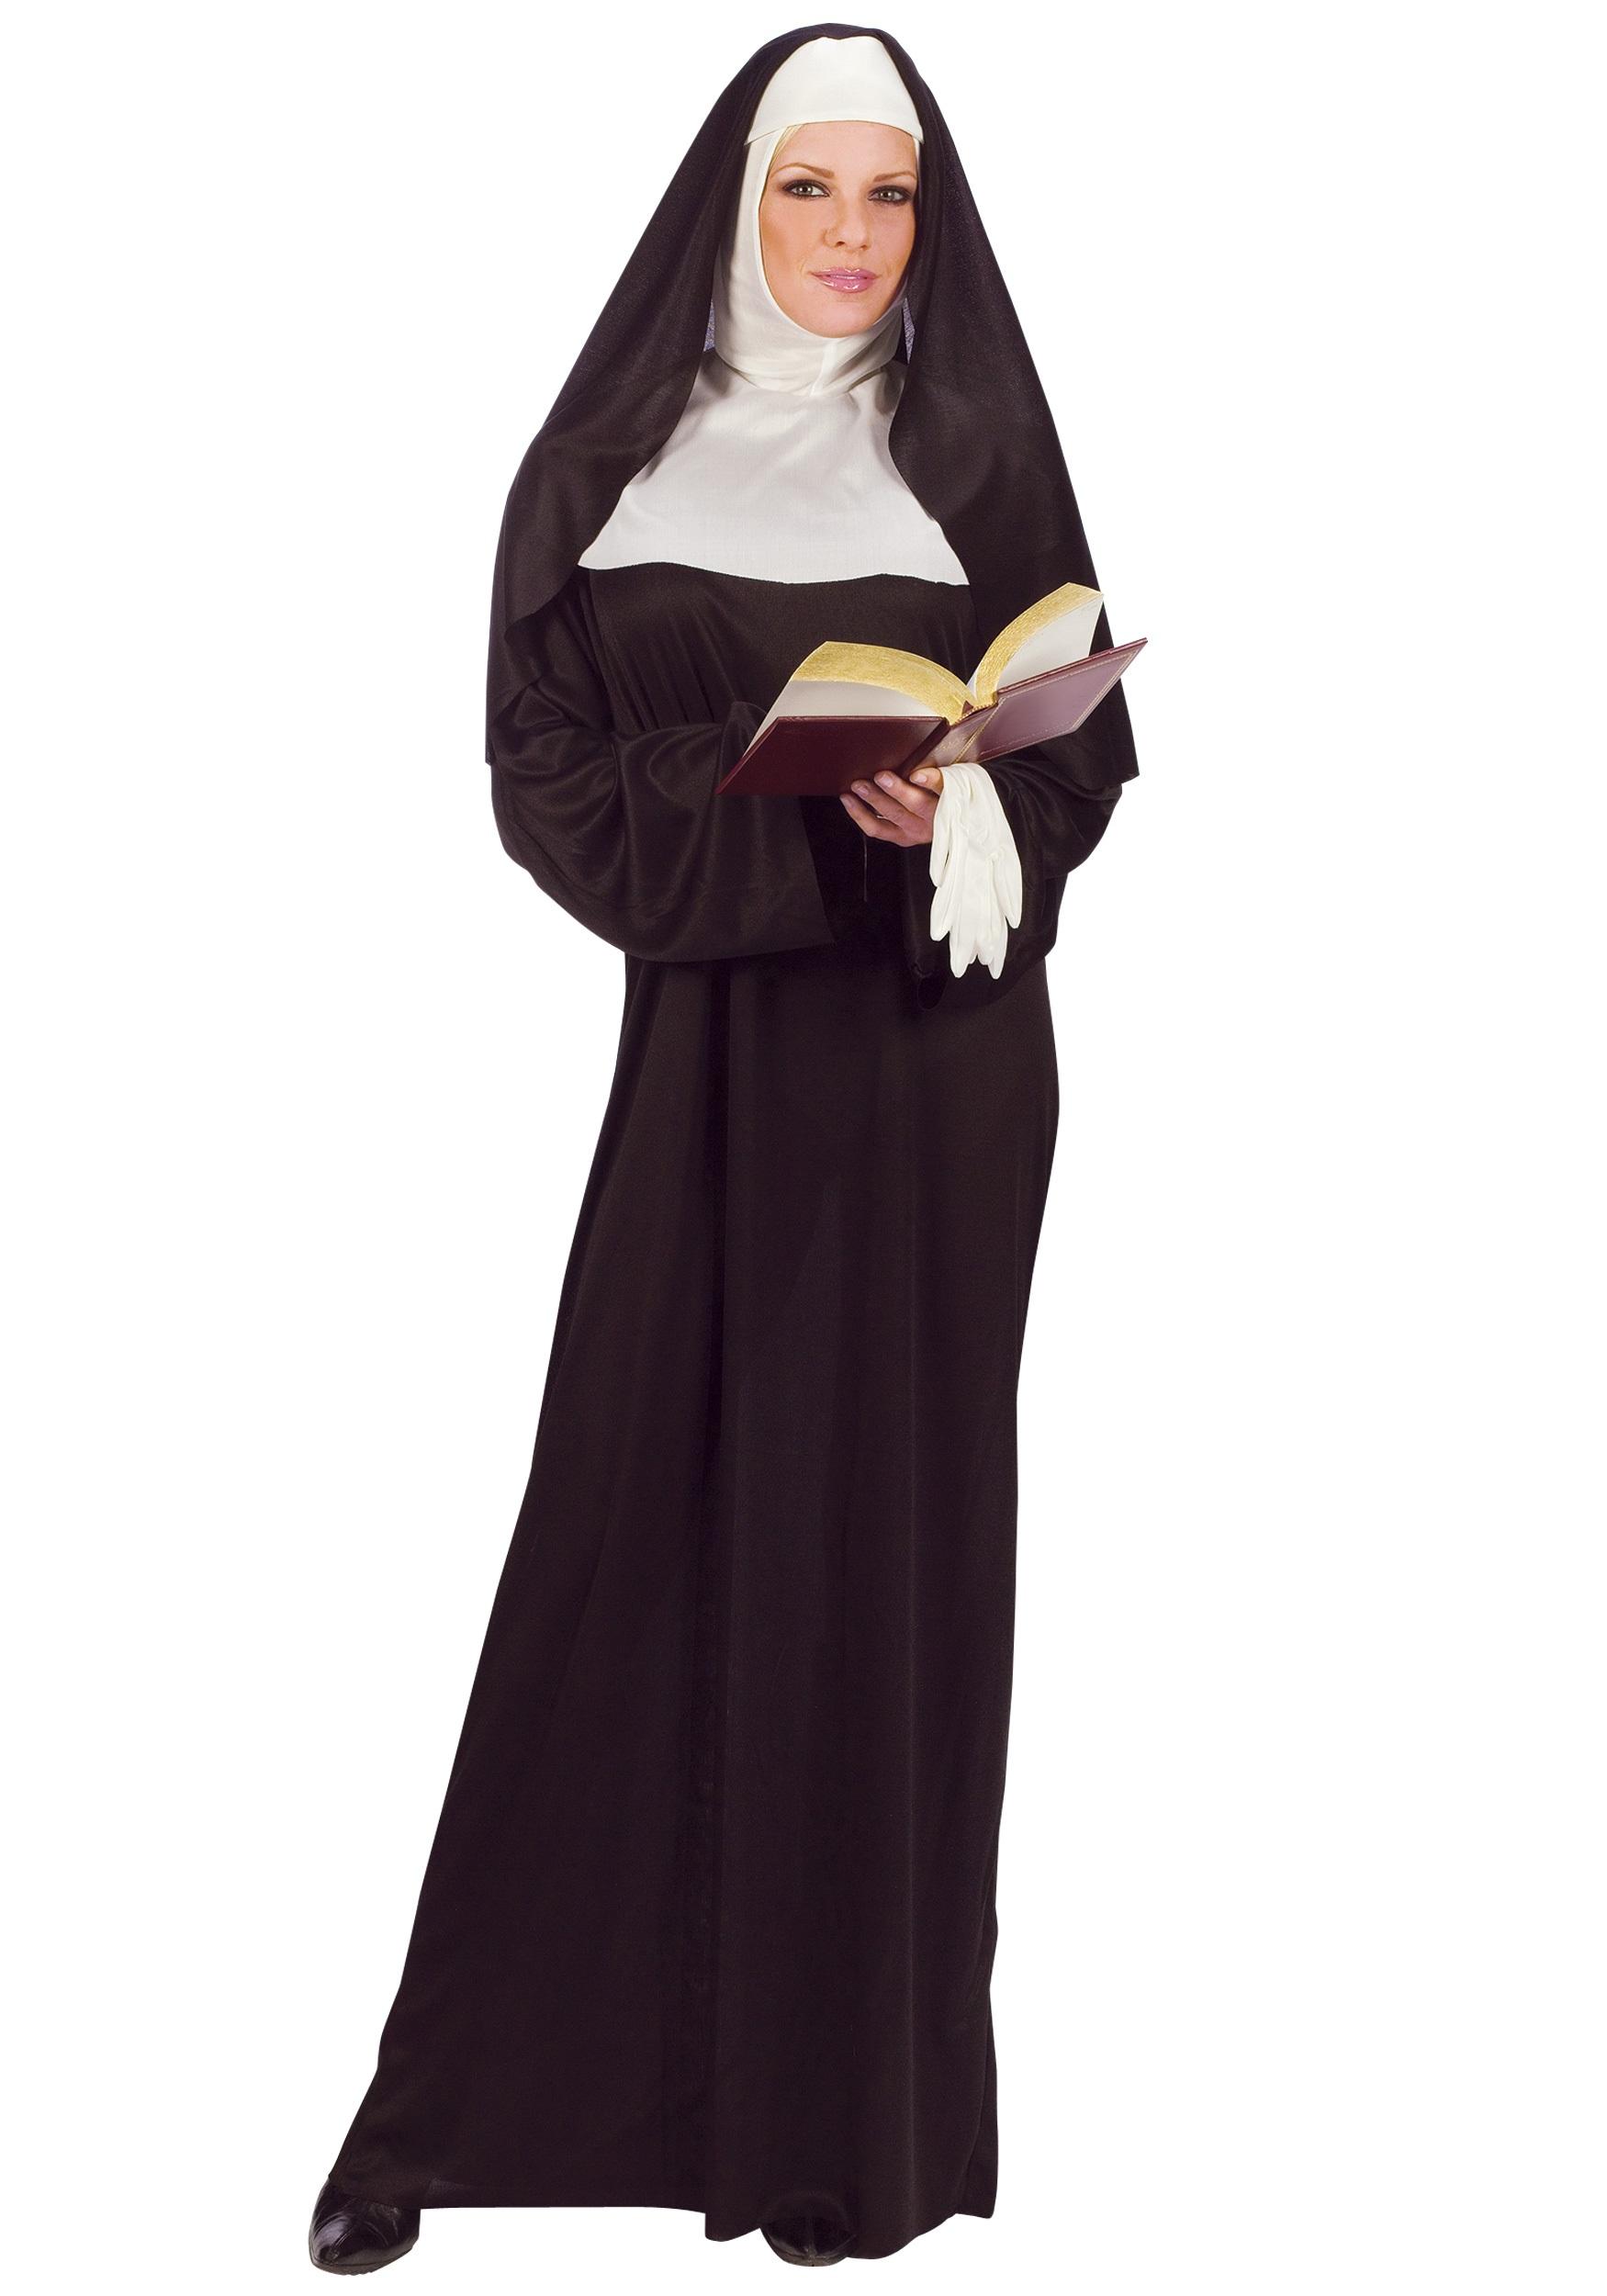 Nun Priest And Religious Halloween Costumes